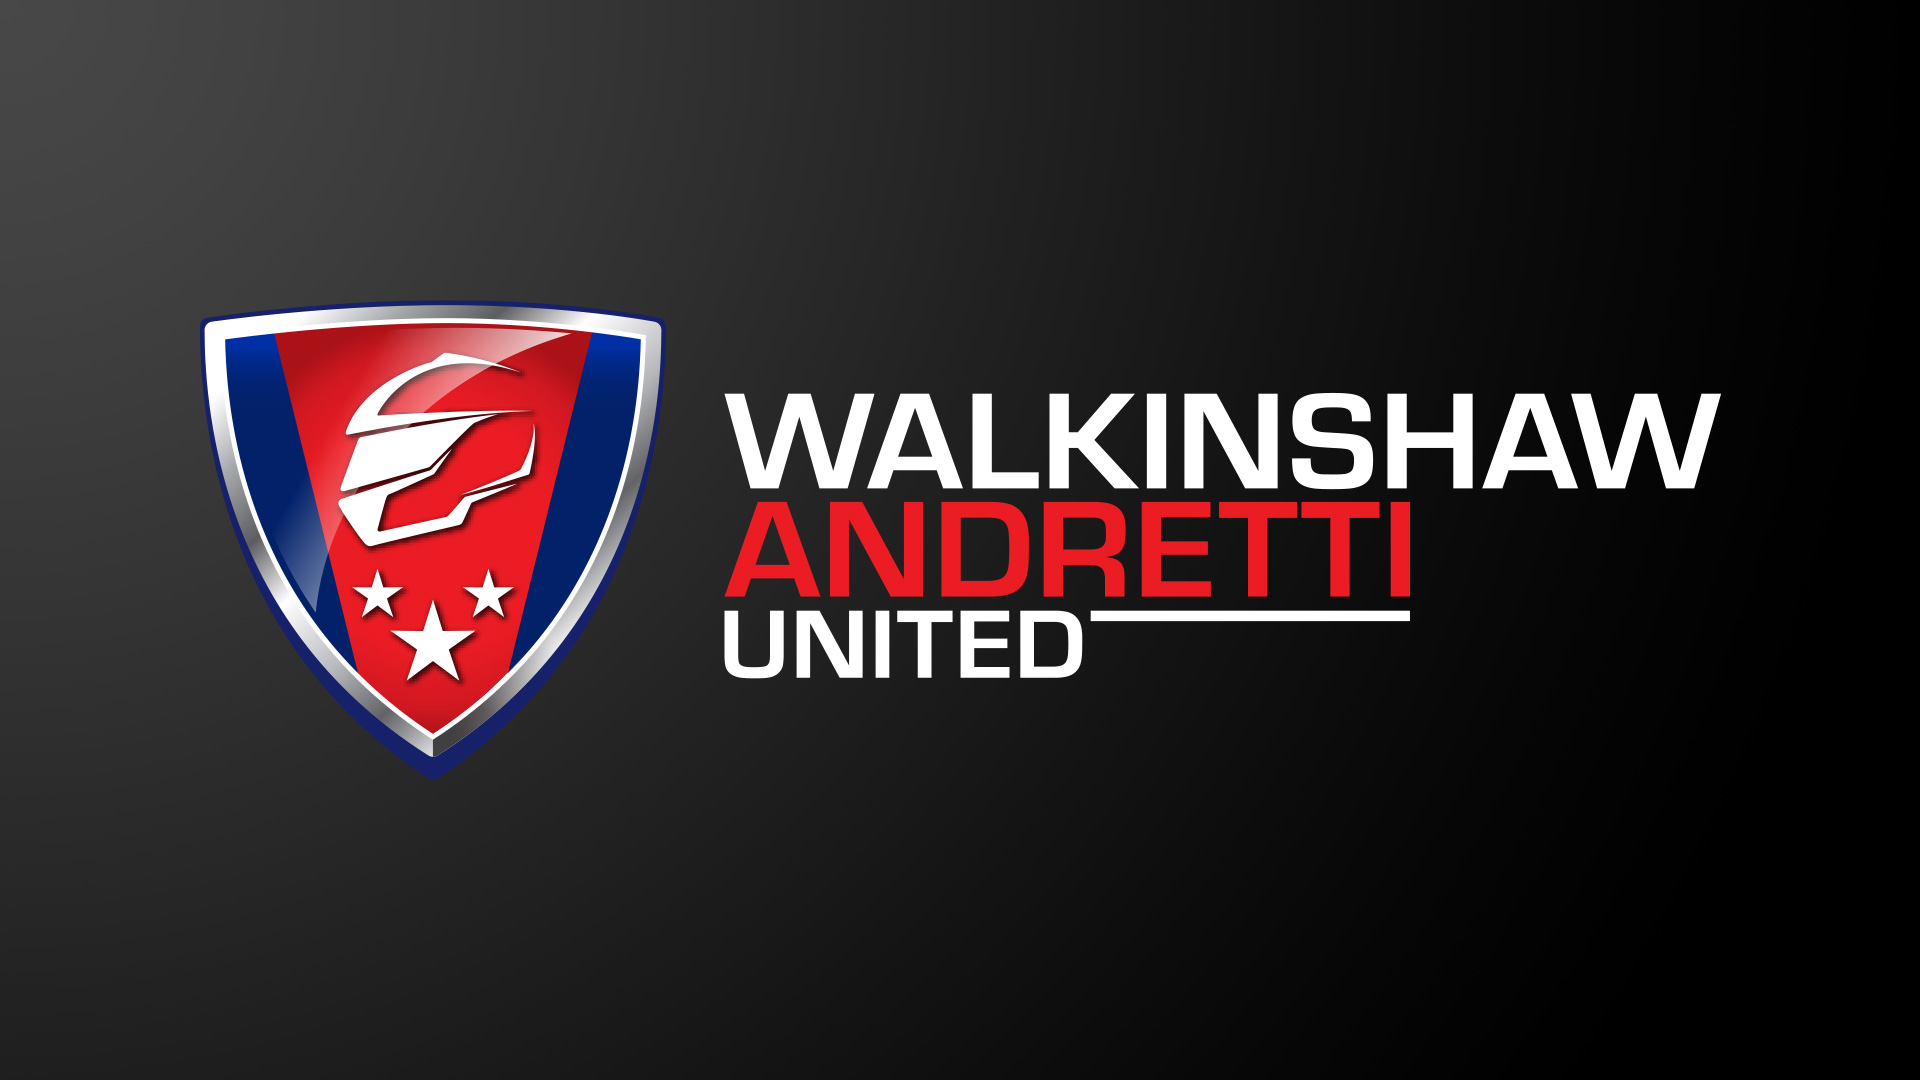 Walkinshaw Andretti United.